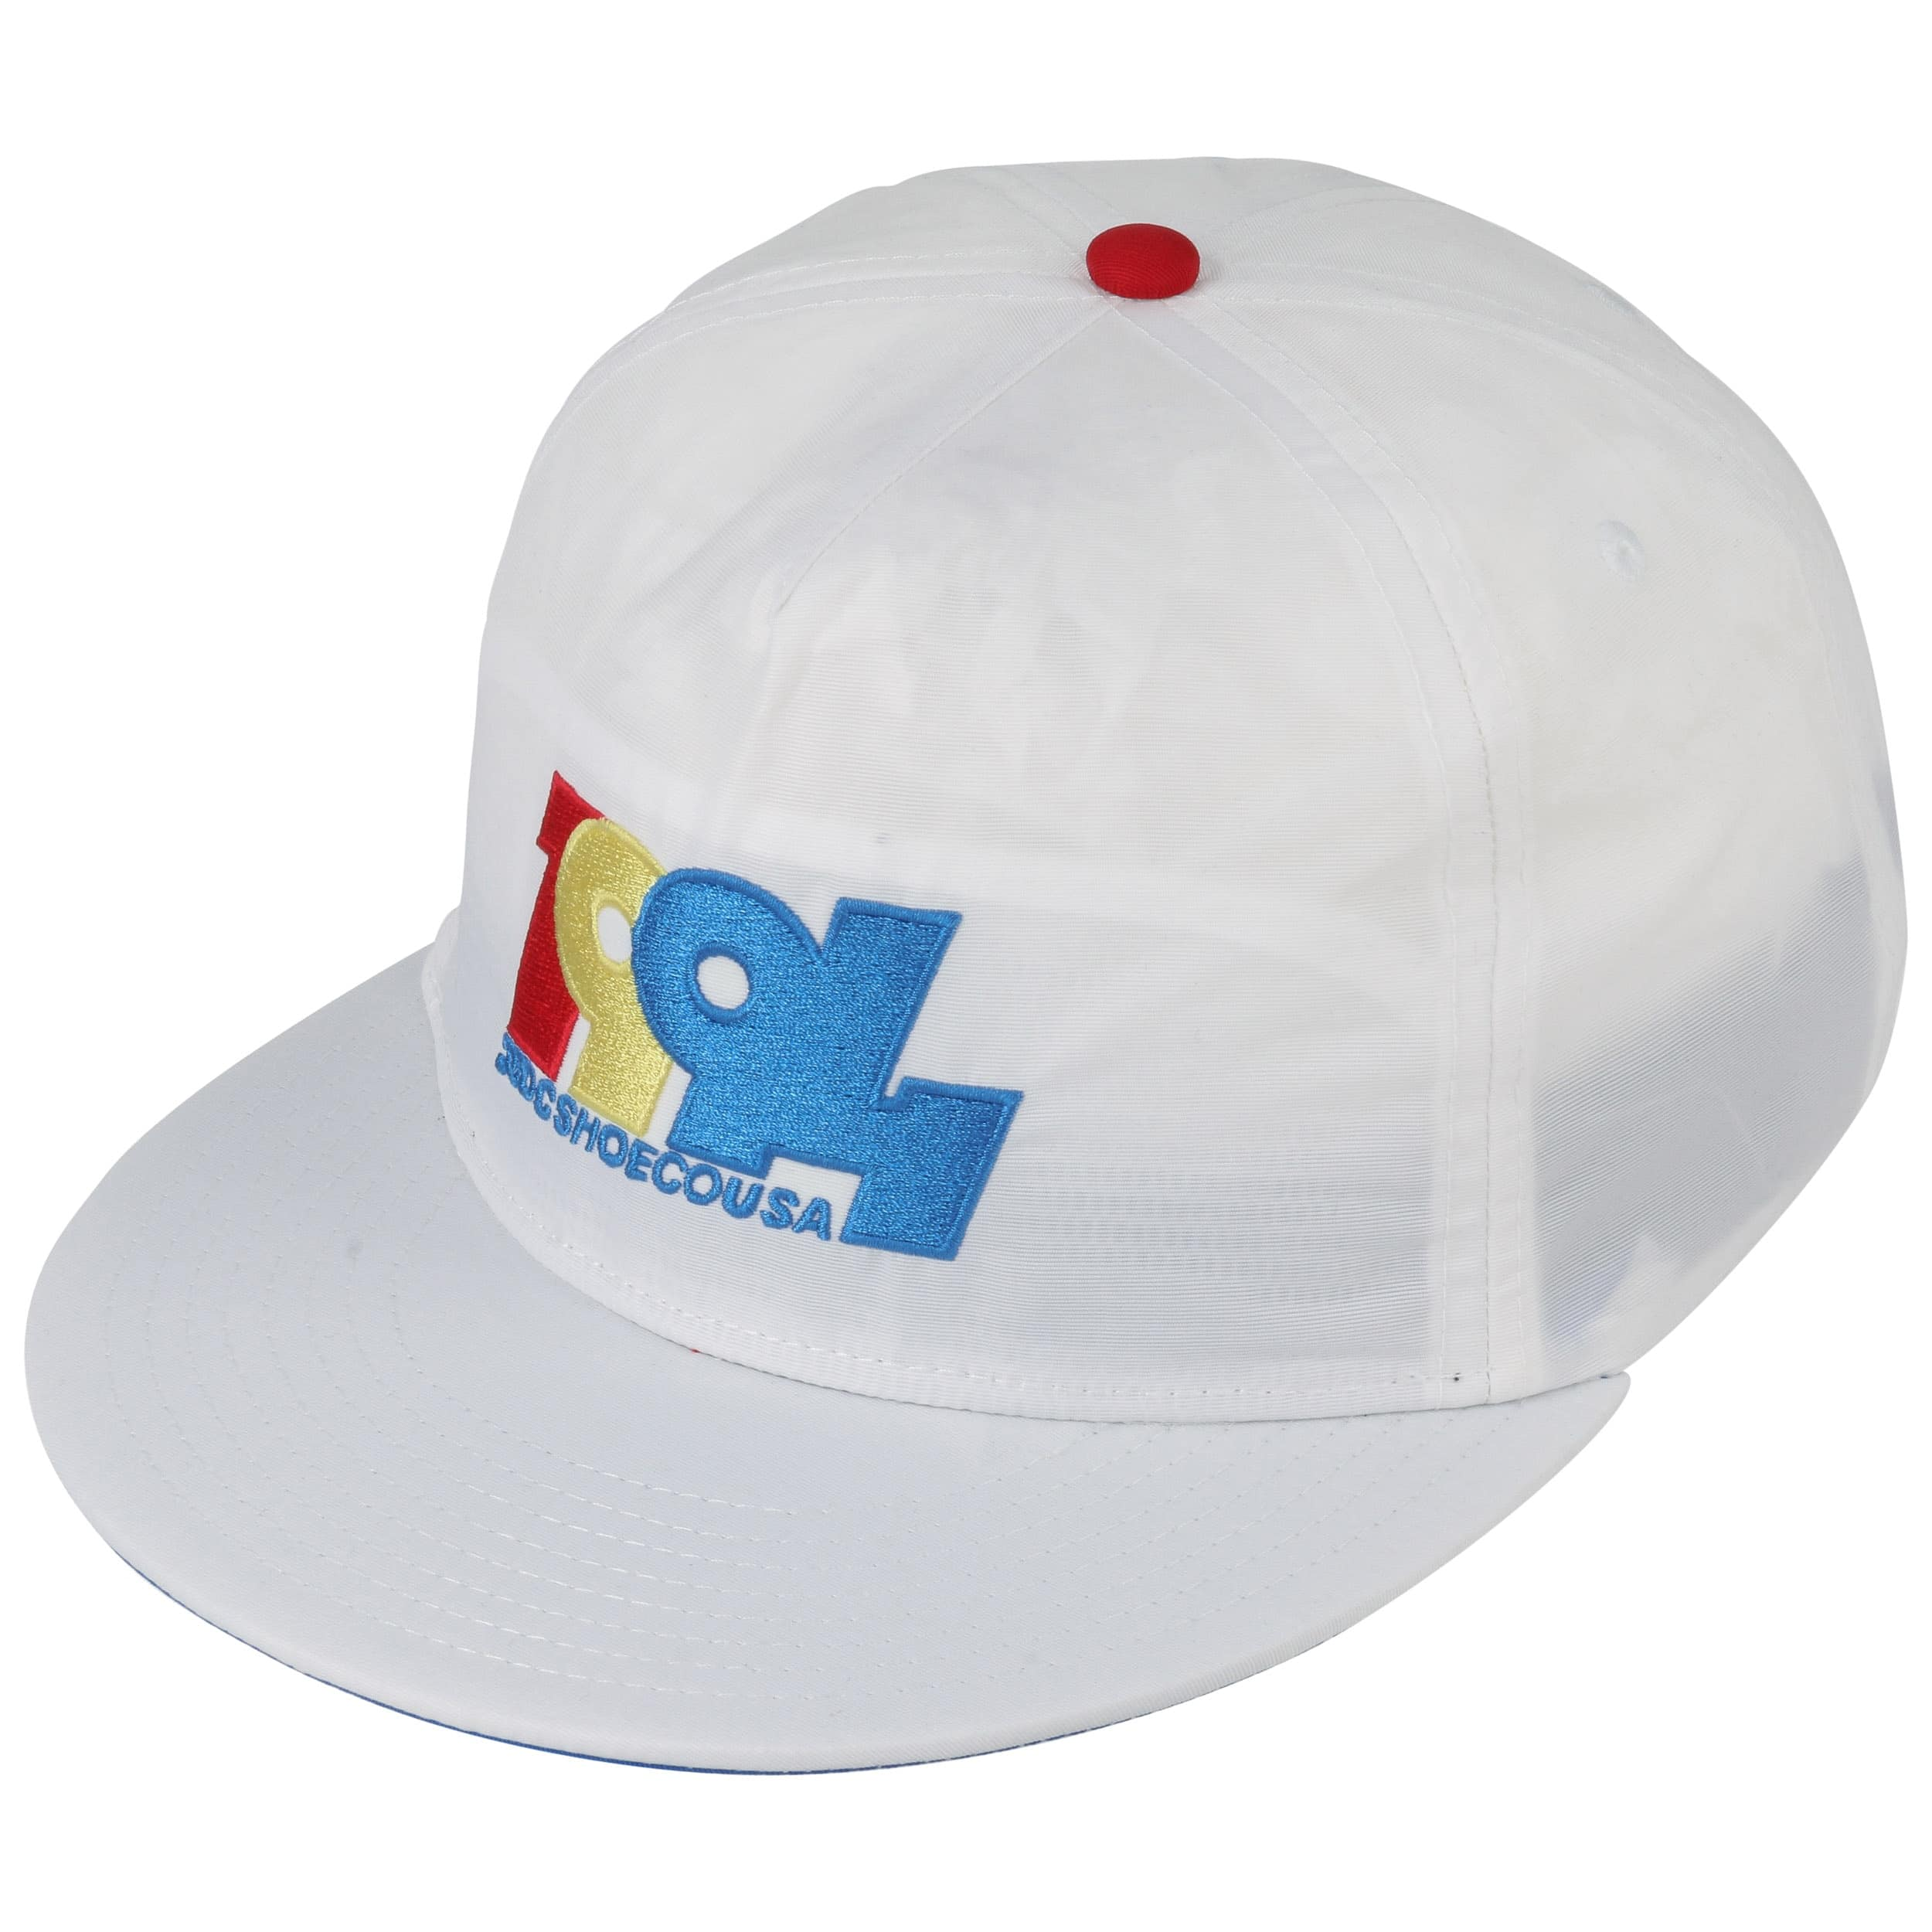 77cf8a1a8c7 ... Graduate Snapback Cap by DC Shoes Co - white 1 ...